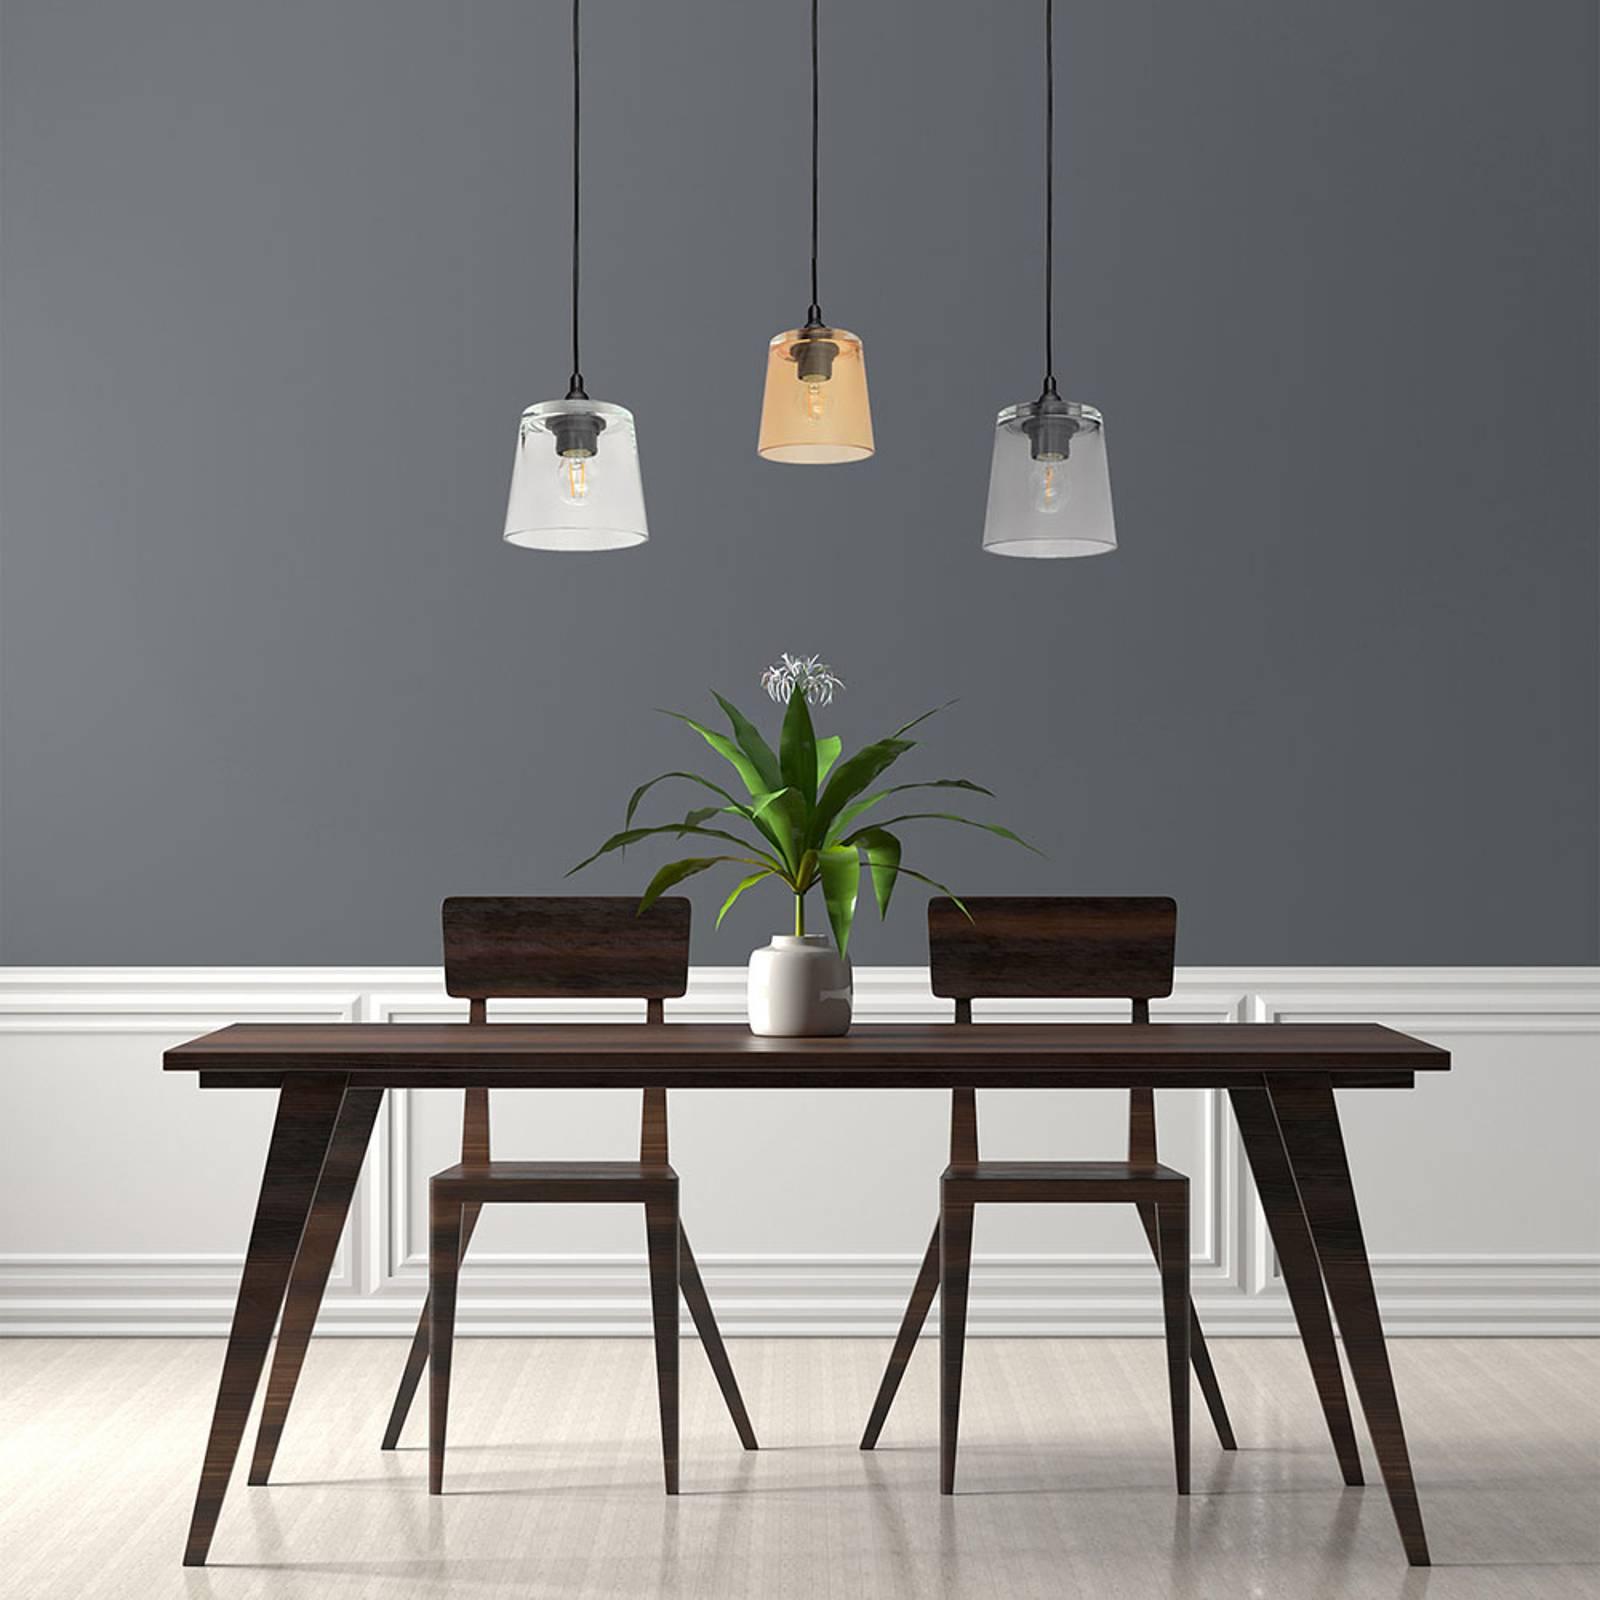 Suspension Lucea 3 lampes transparente/smoke/ambre